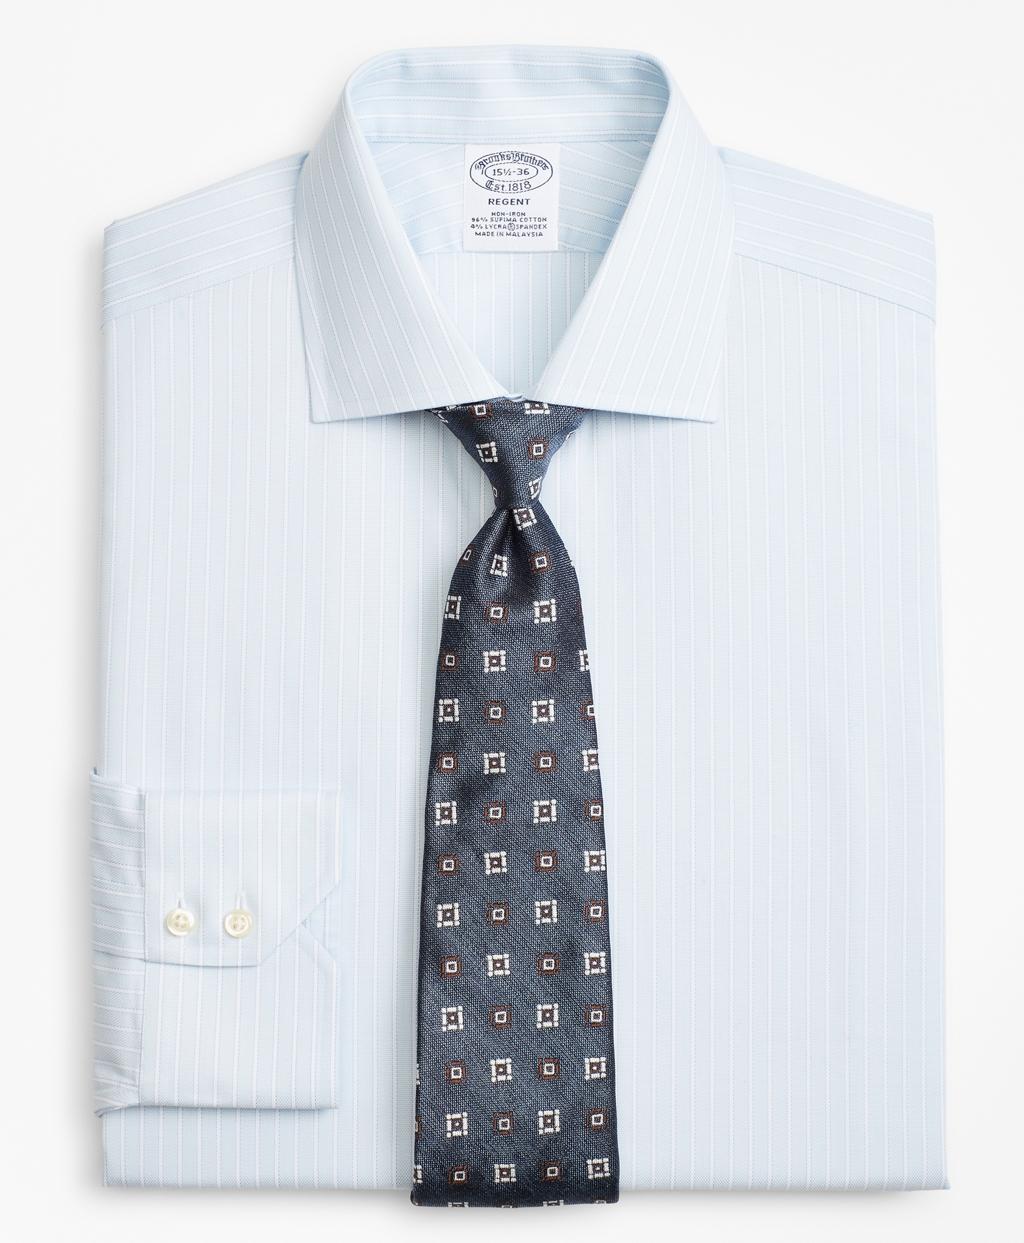 Stretch Regent Fitted Dress Shirt Non Iron Oxford Stripe Brooks